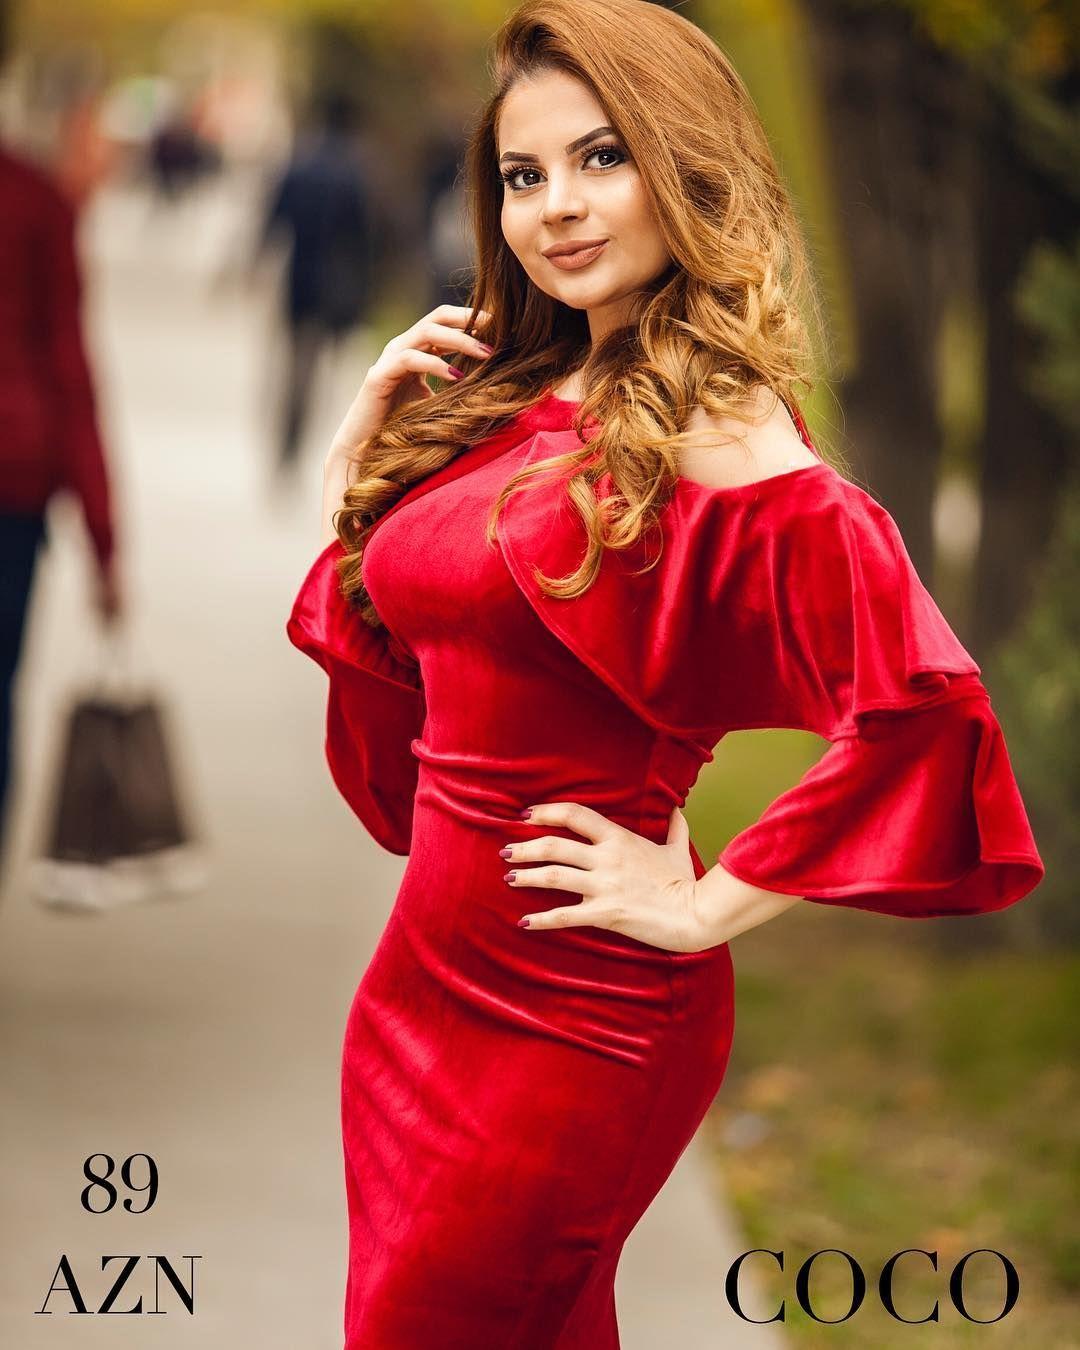 7 992 Begenme 117 Yorum Instagram 39 Da Coco Baku Coco Baku Quot Hətta Yeni Kolleksiyamizda Da Uygun Qi Dresses With Sleeves Long Sleeve Dress Fashion